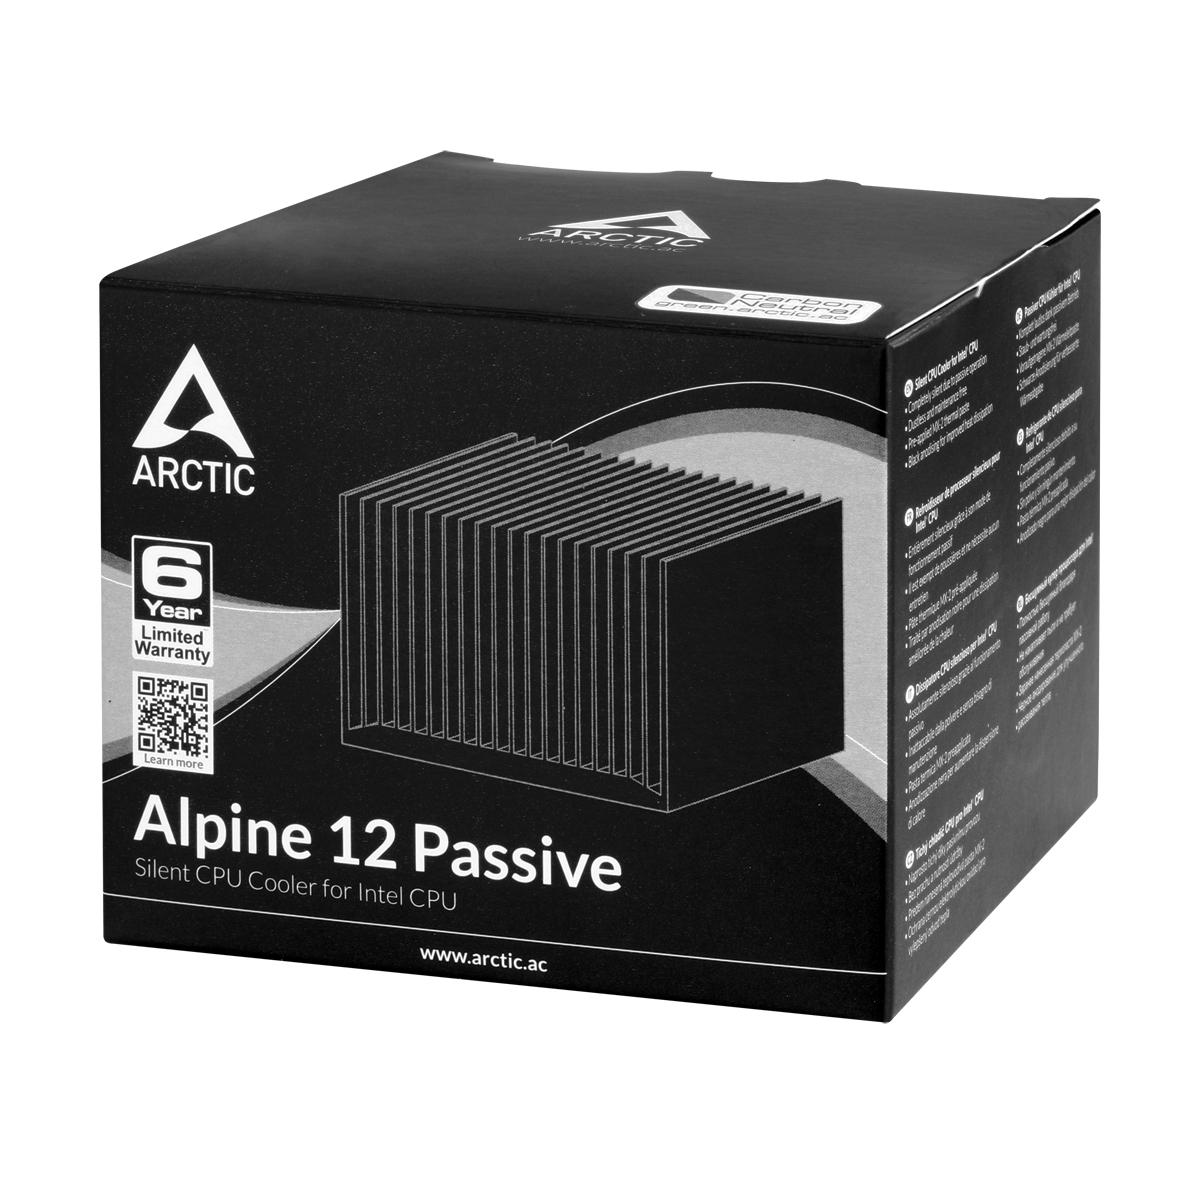 Alpine 12 Passive